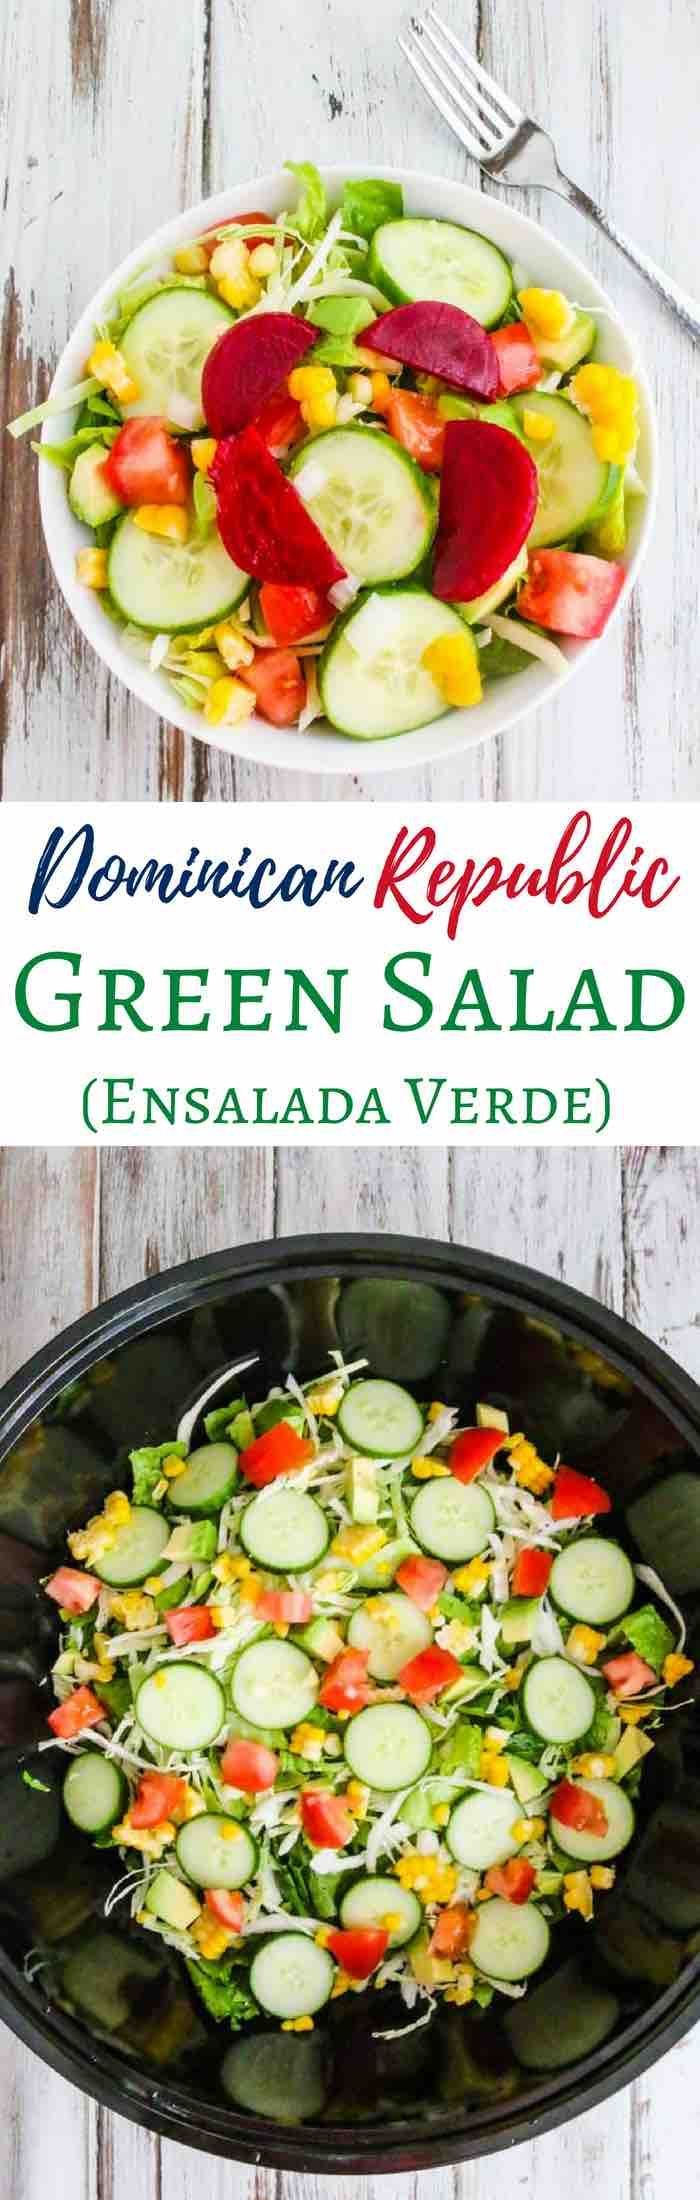 Dominican Republic Green Salad - simple, healthy delicious salad with sweet corn